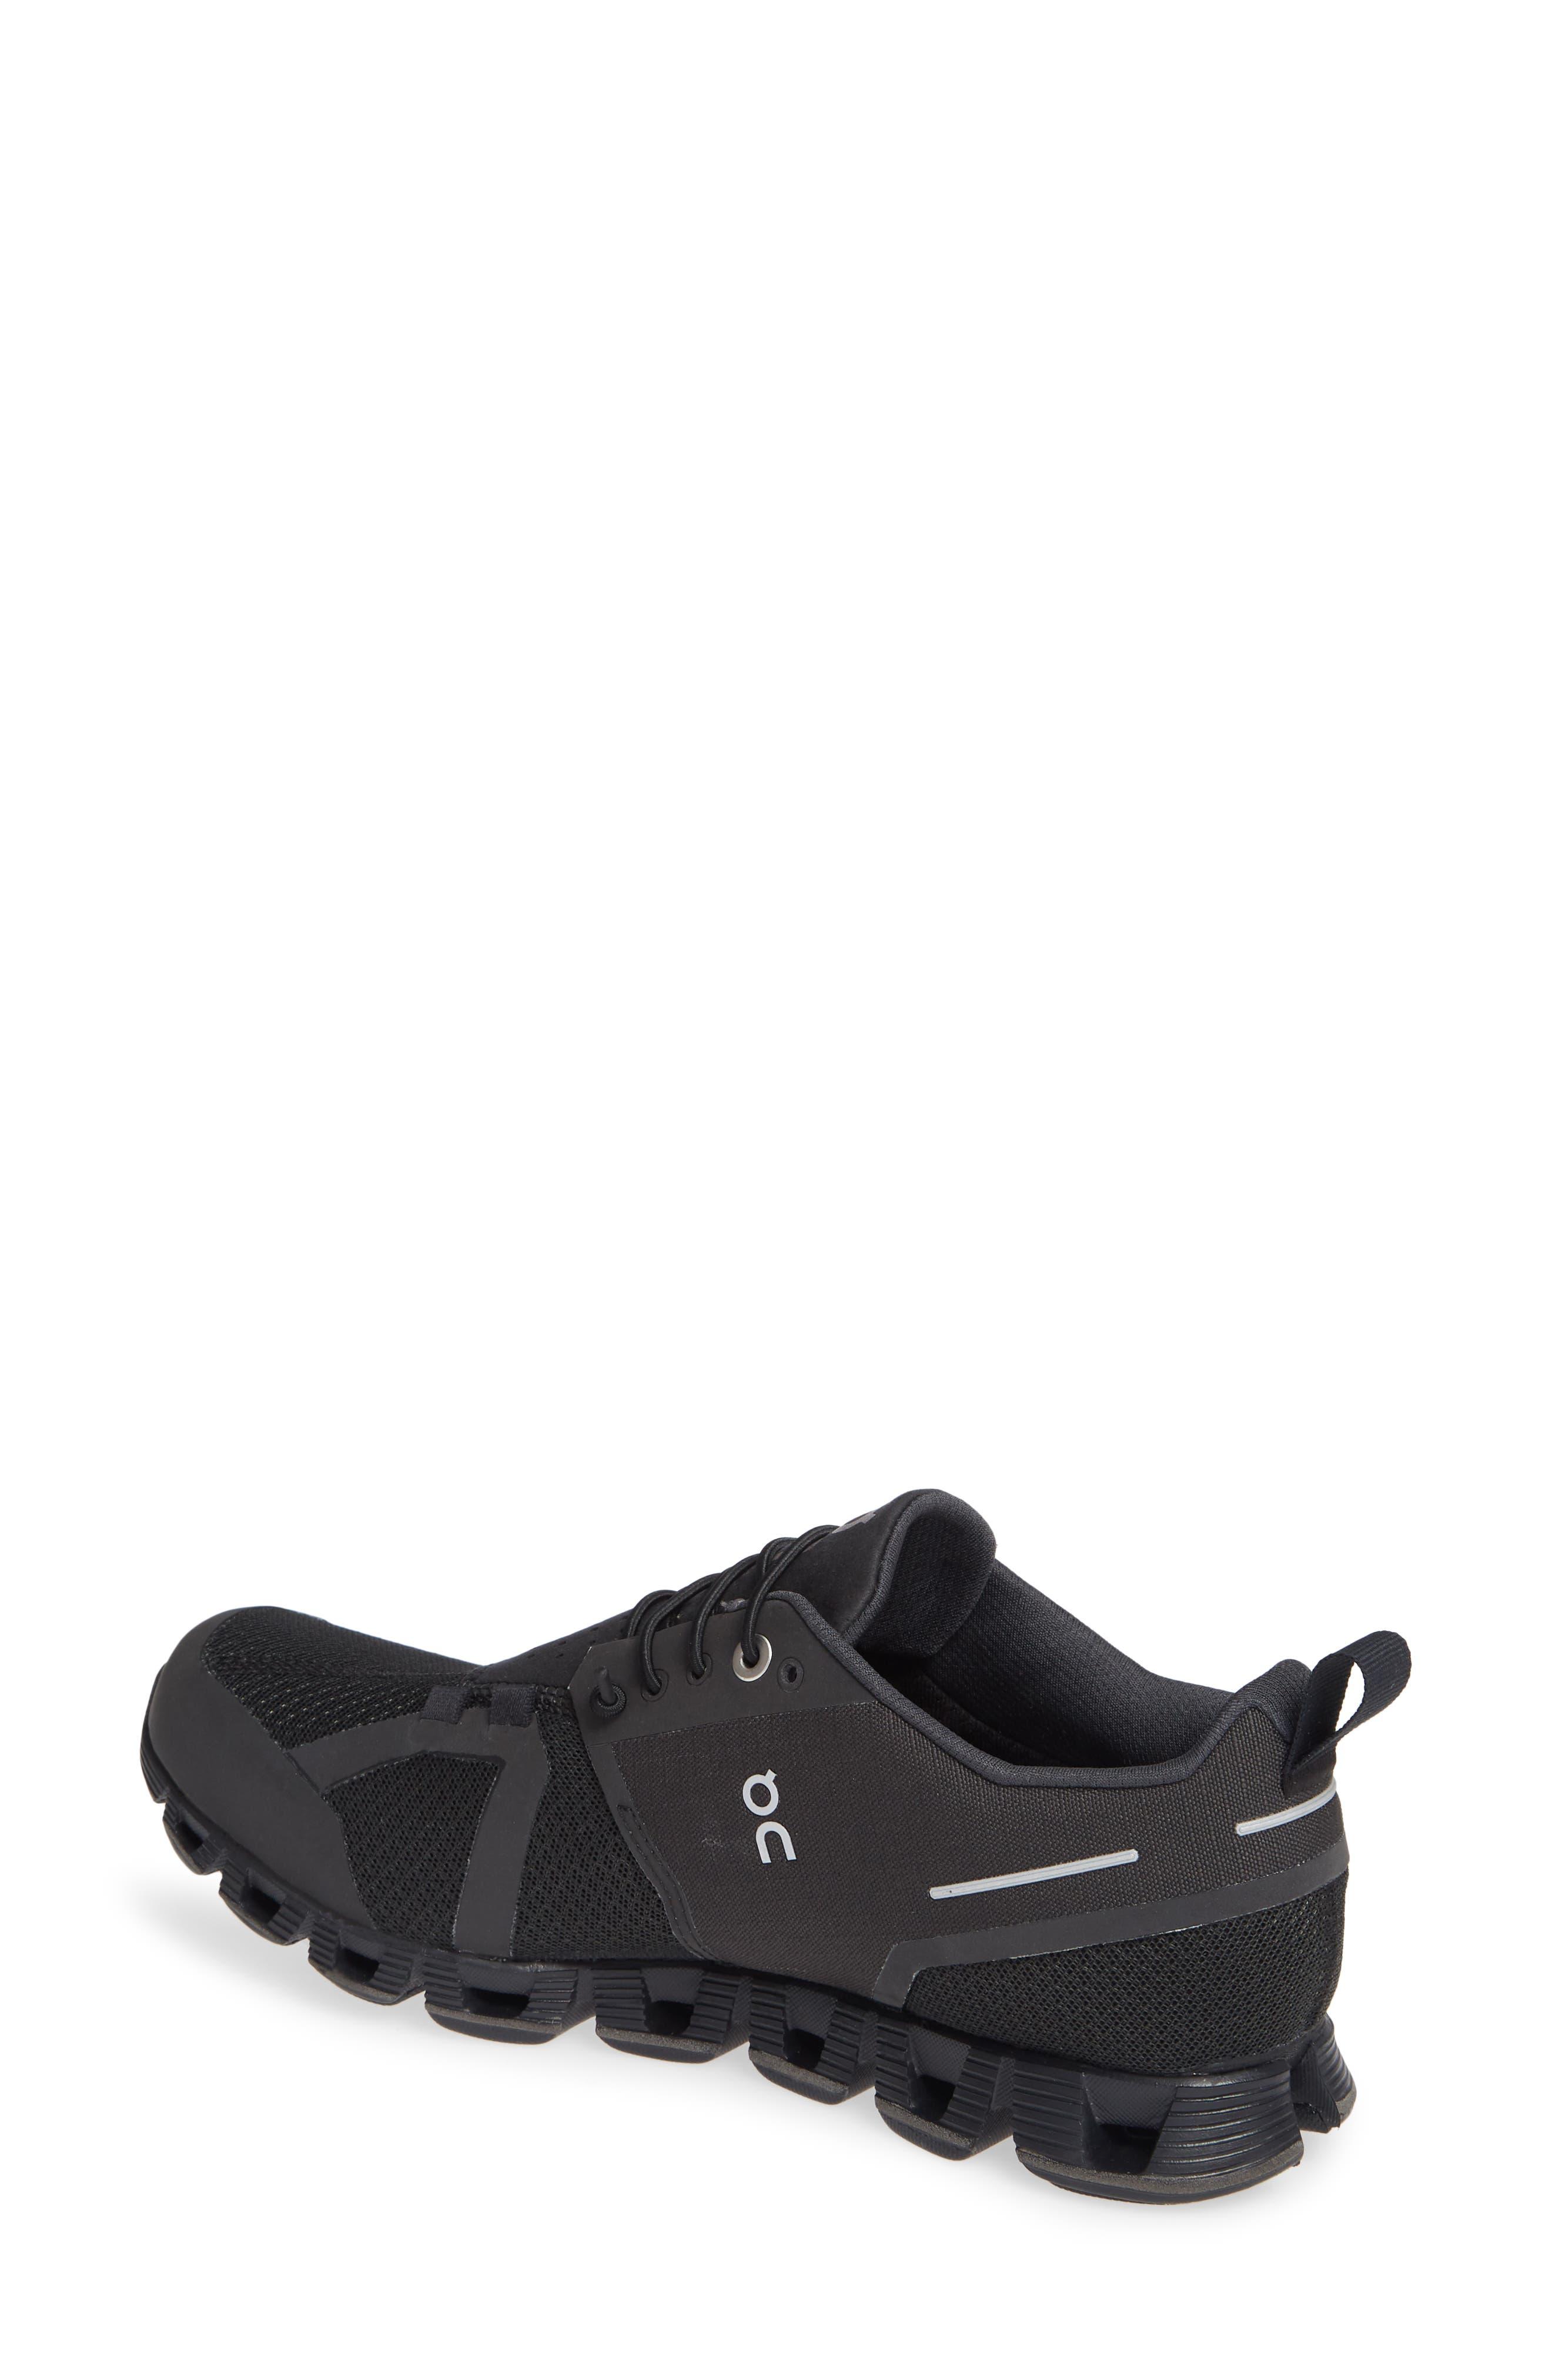 Cloud Waterproof Running Shoe,                             Alternate thumbnail 2, color,                             BLACK/ LUNAR